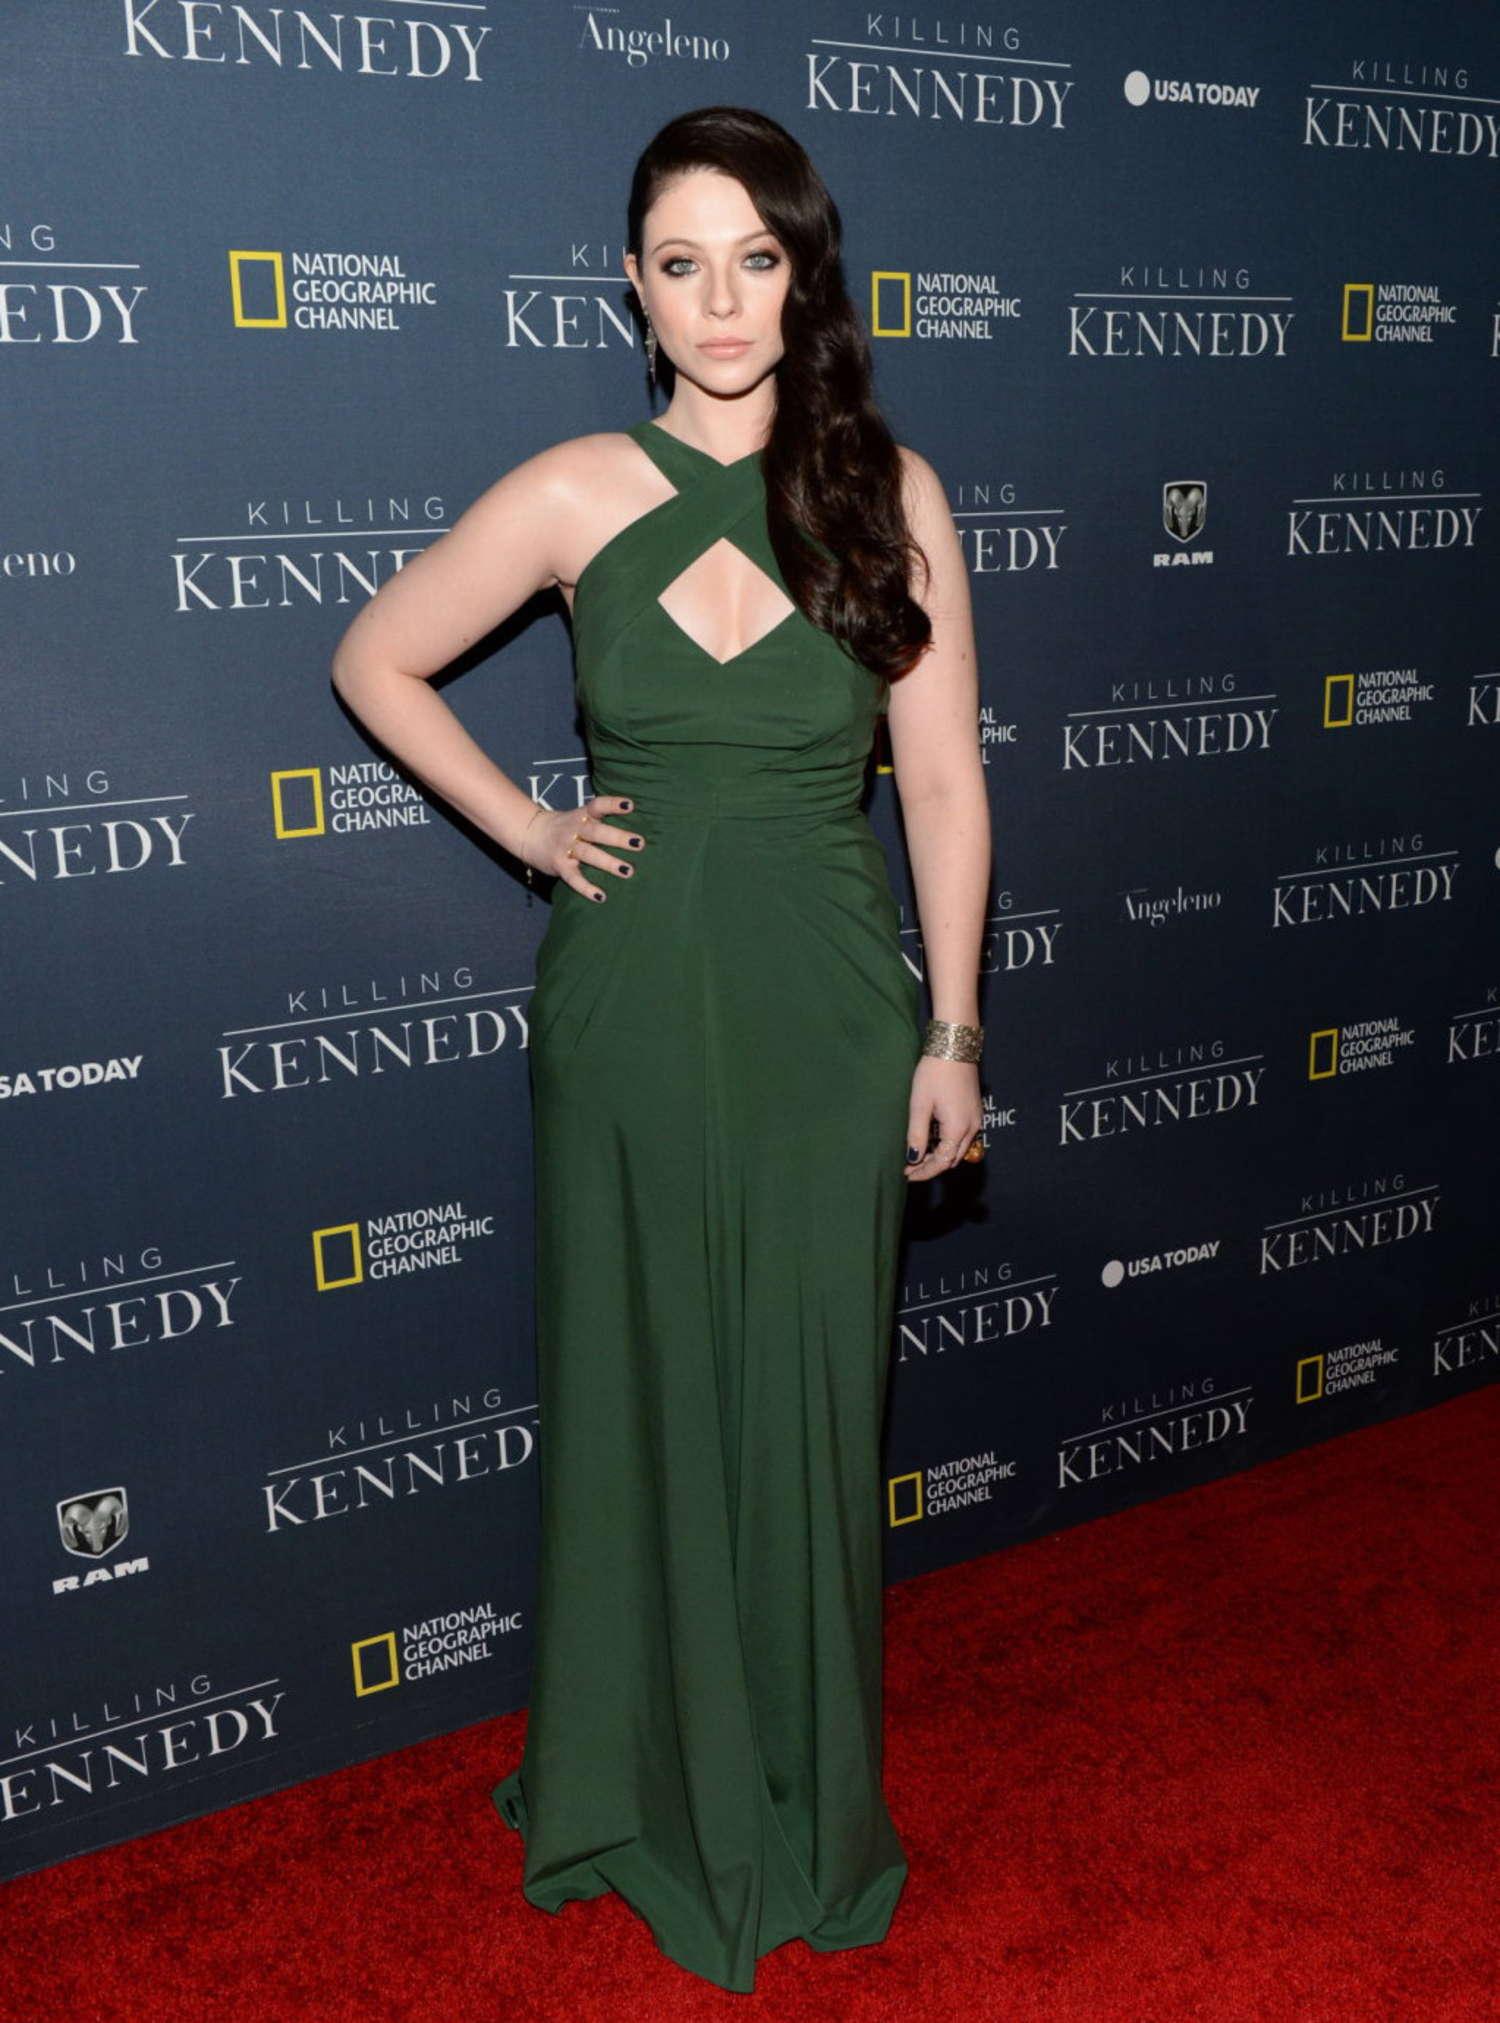 Michelle Trachtenberg: Killing Kennedy Premiere -14 - GotCeleb